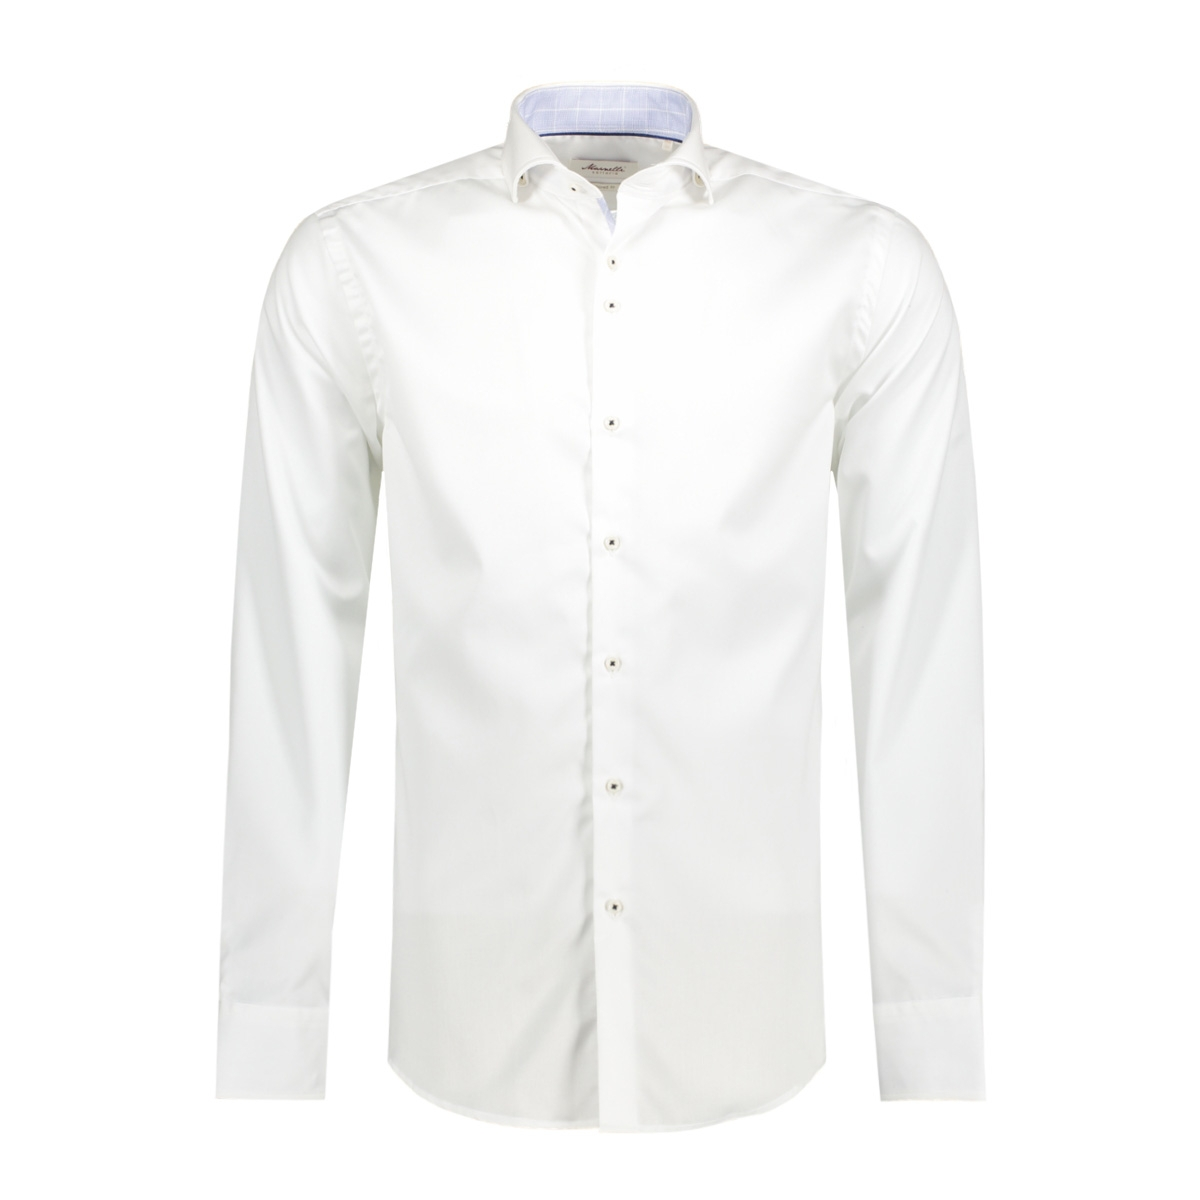 21-244812-17pm311 marnelli overhemd 004